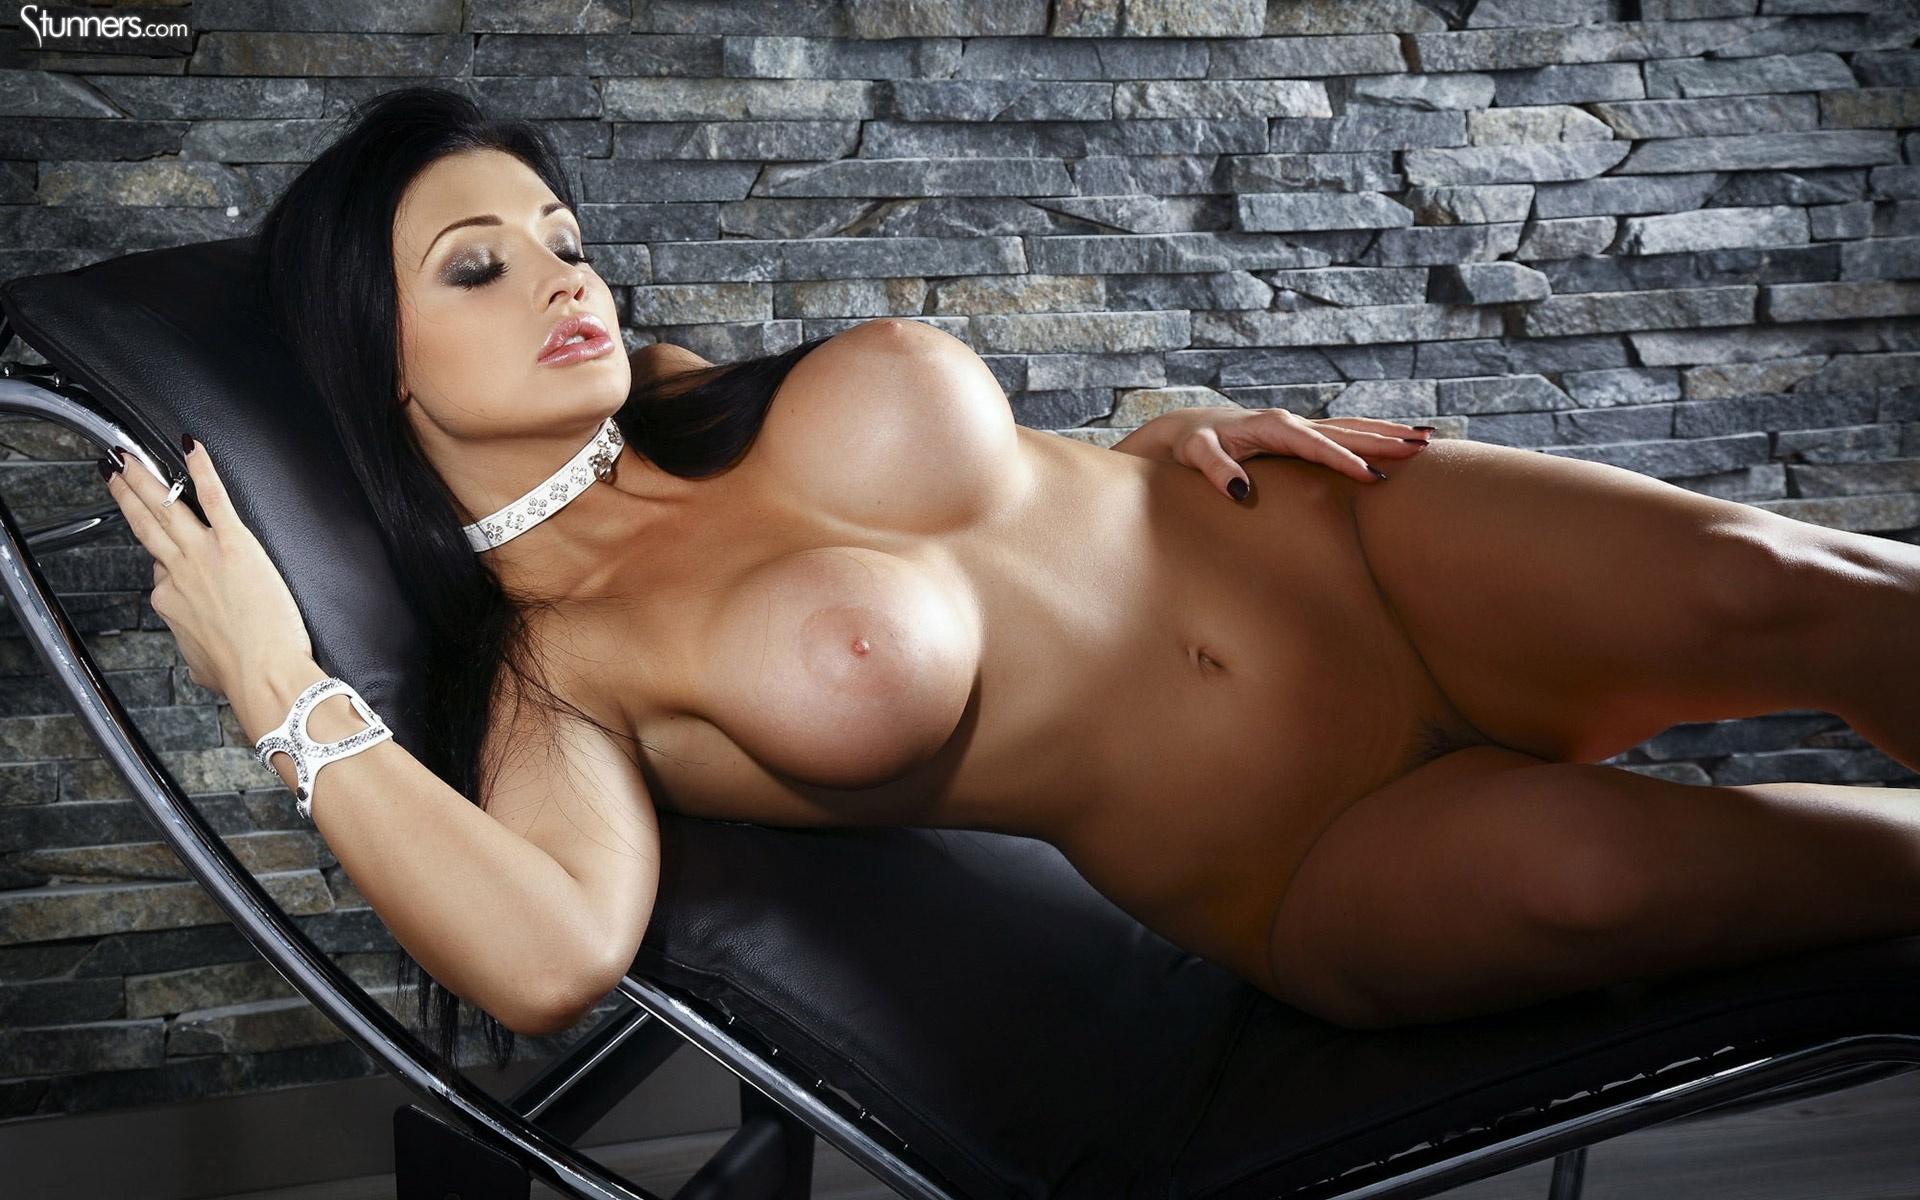 watch free porn videos on nintendo dsi